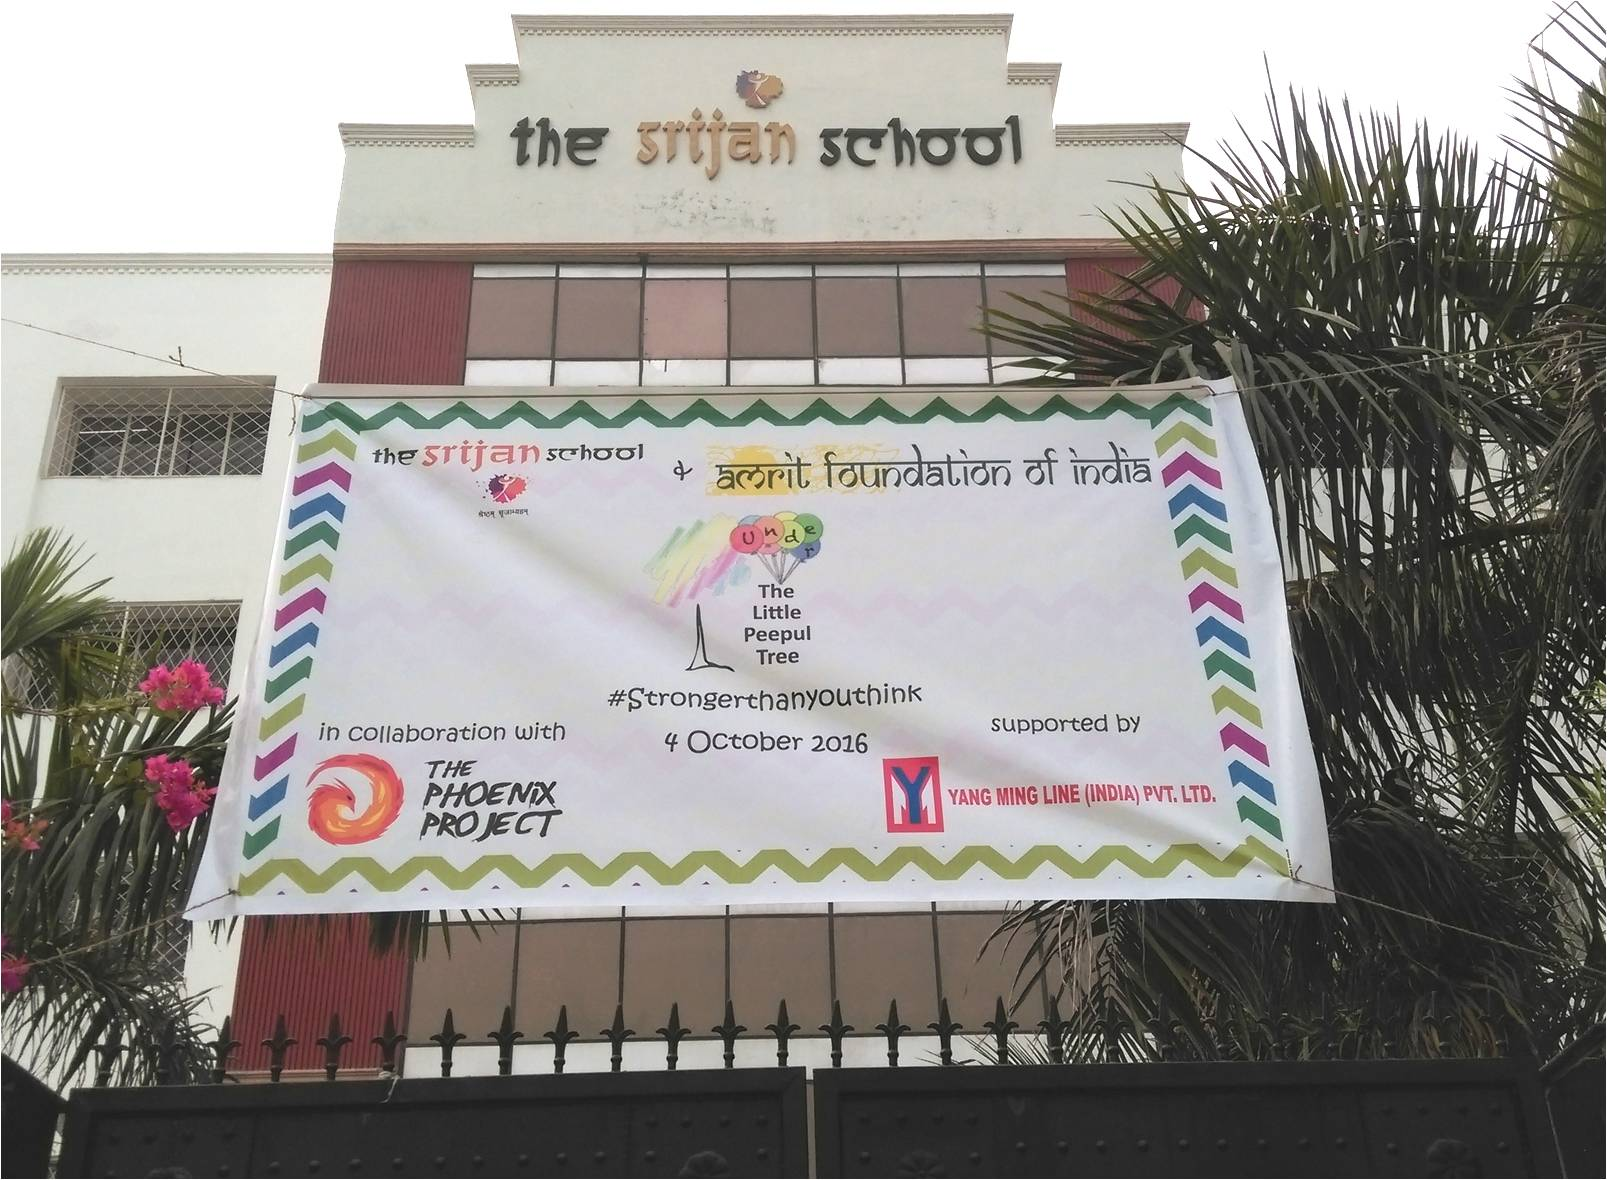 The Amrit banner